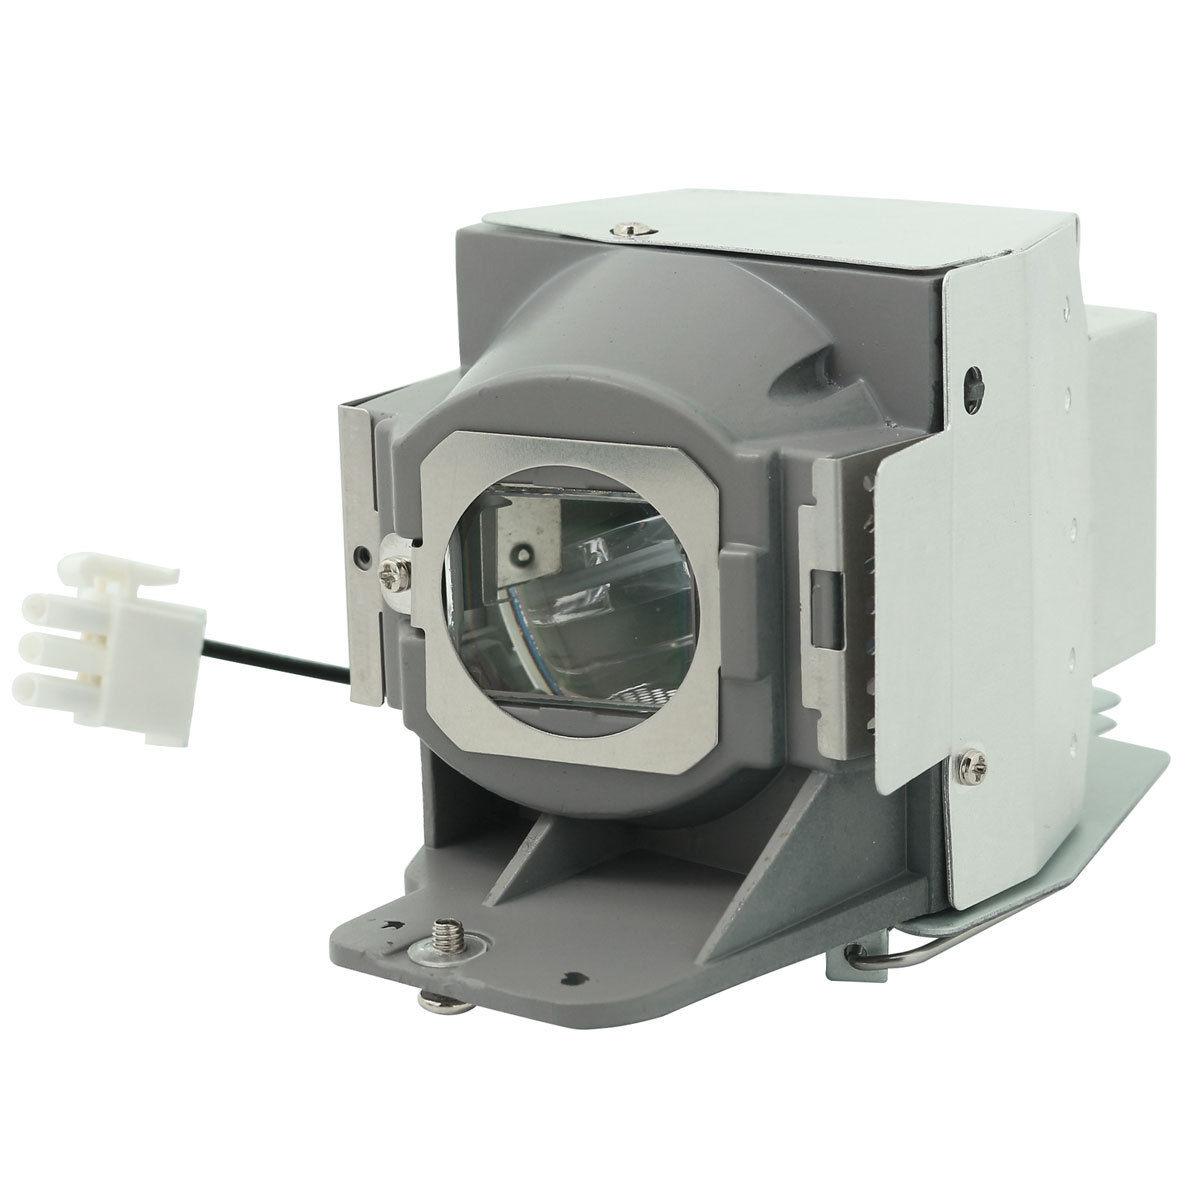 Projector Lamp Bulb P-VIP 210/0.8 E20.9n RLC-079 RLC079 for Viewsonic PJD7820HD Projector Bulb Lamp with housing rlc 072 p vip 180 0 8 e20 8 original projector lamp with housing for pjd5233 pjd5353 pjd5523w